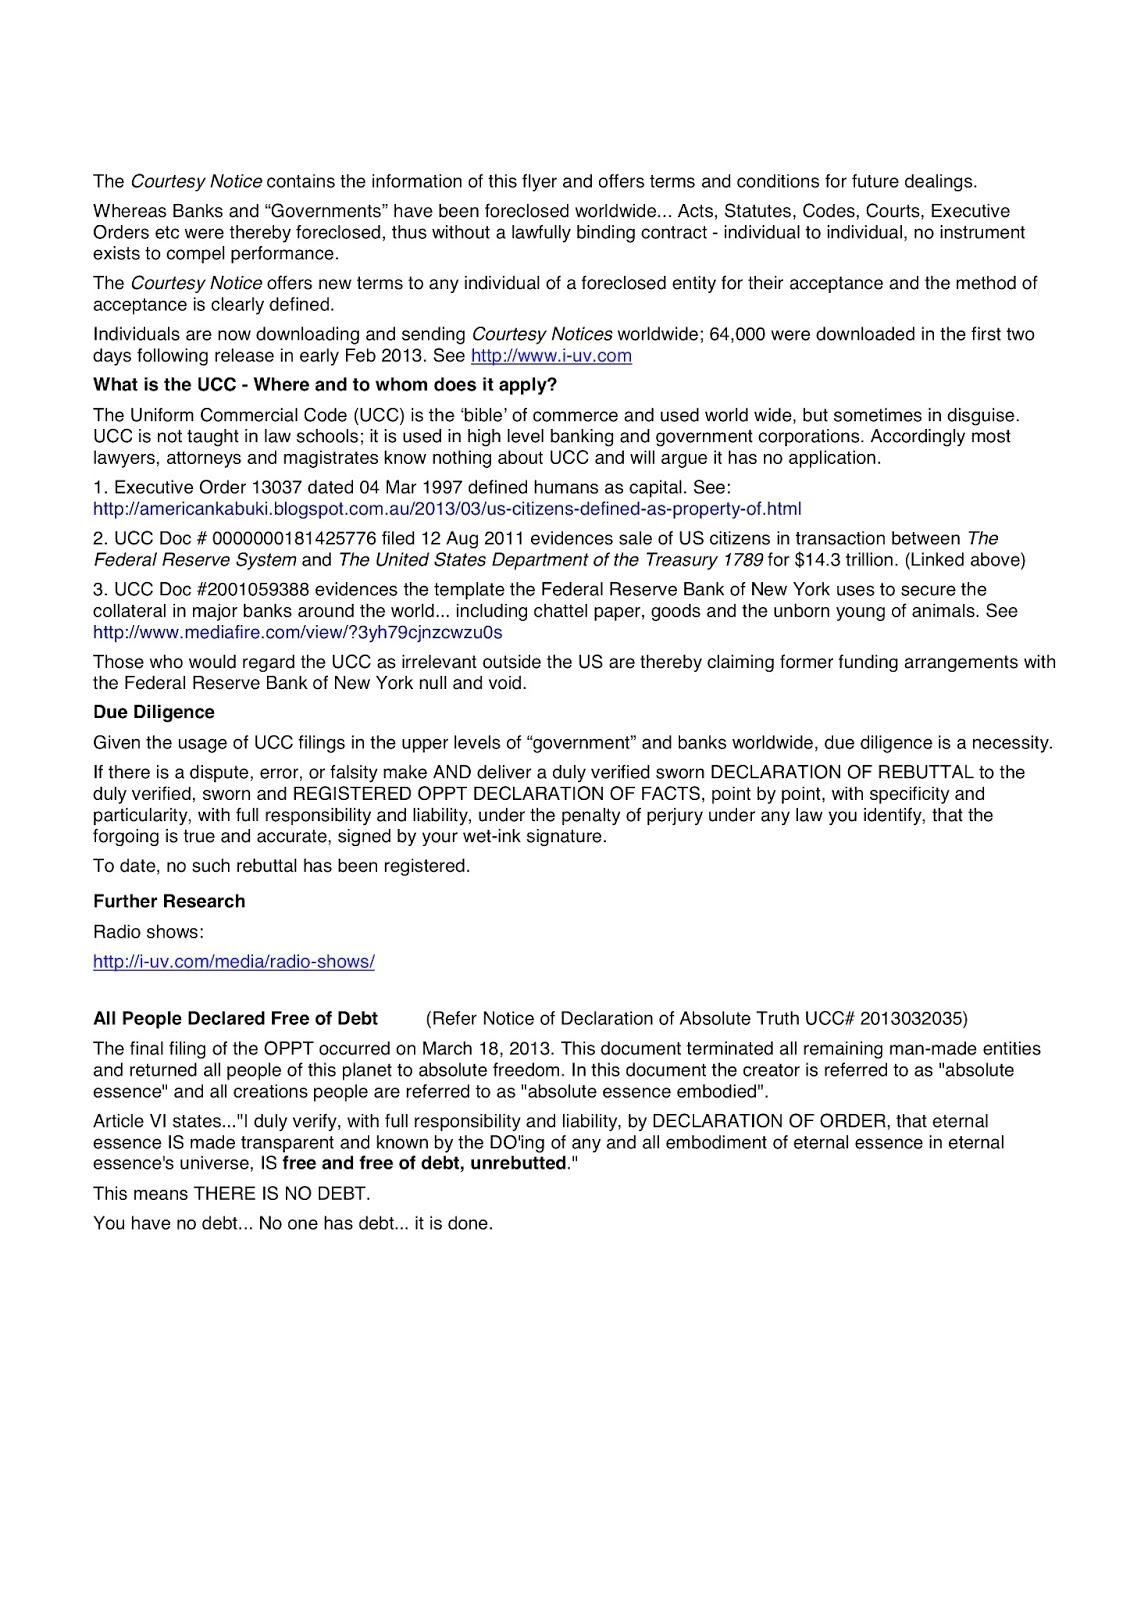 fair debt collection practices act notice